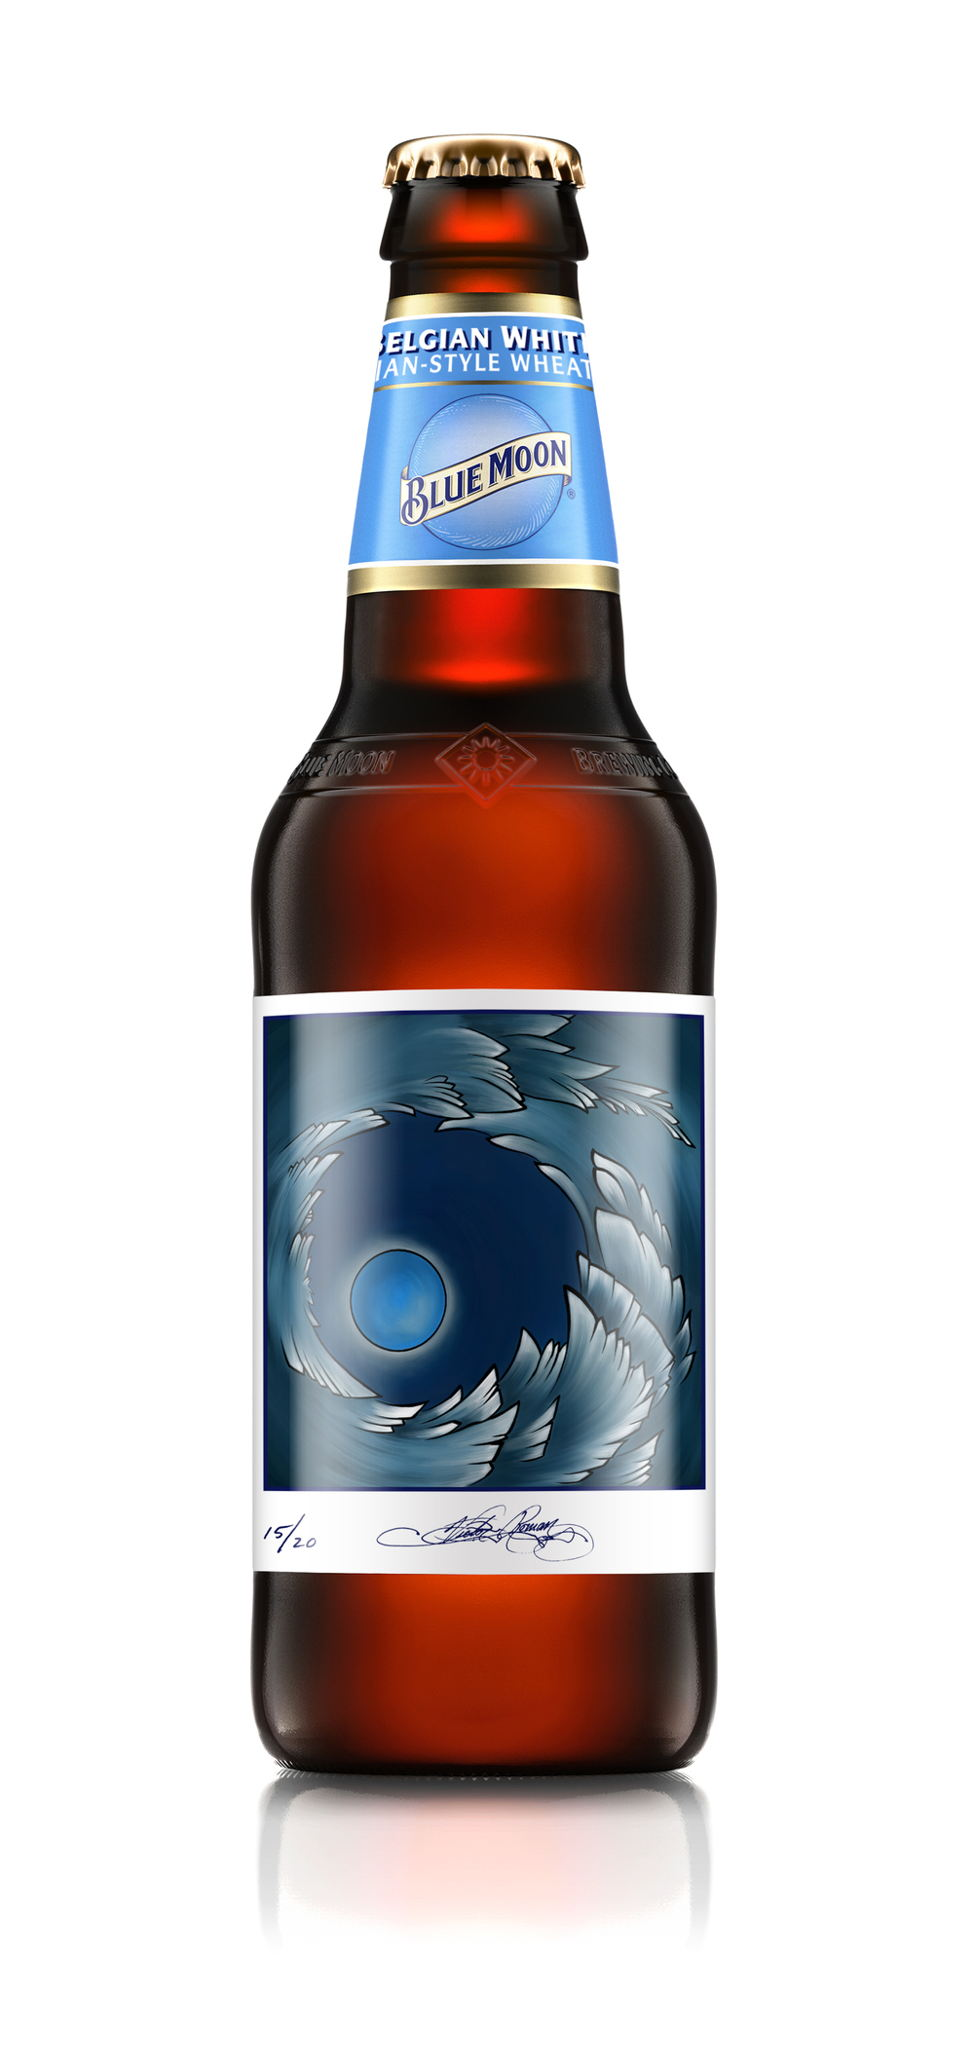 BMO-195A_Bottle_12z_Render_VictorRoman_150401_FJ.jpg